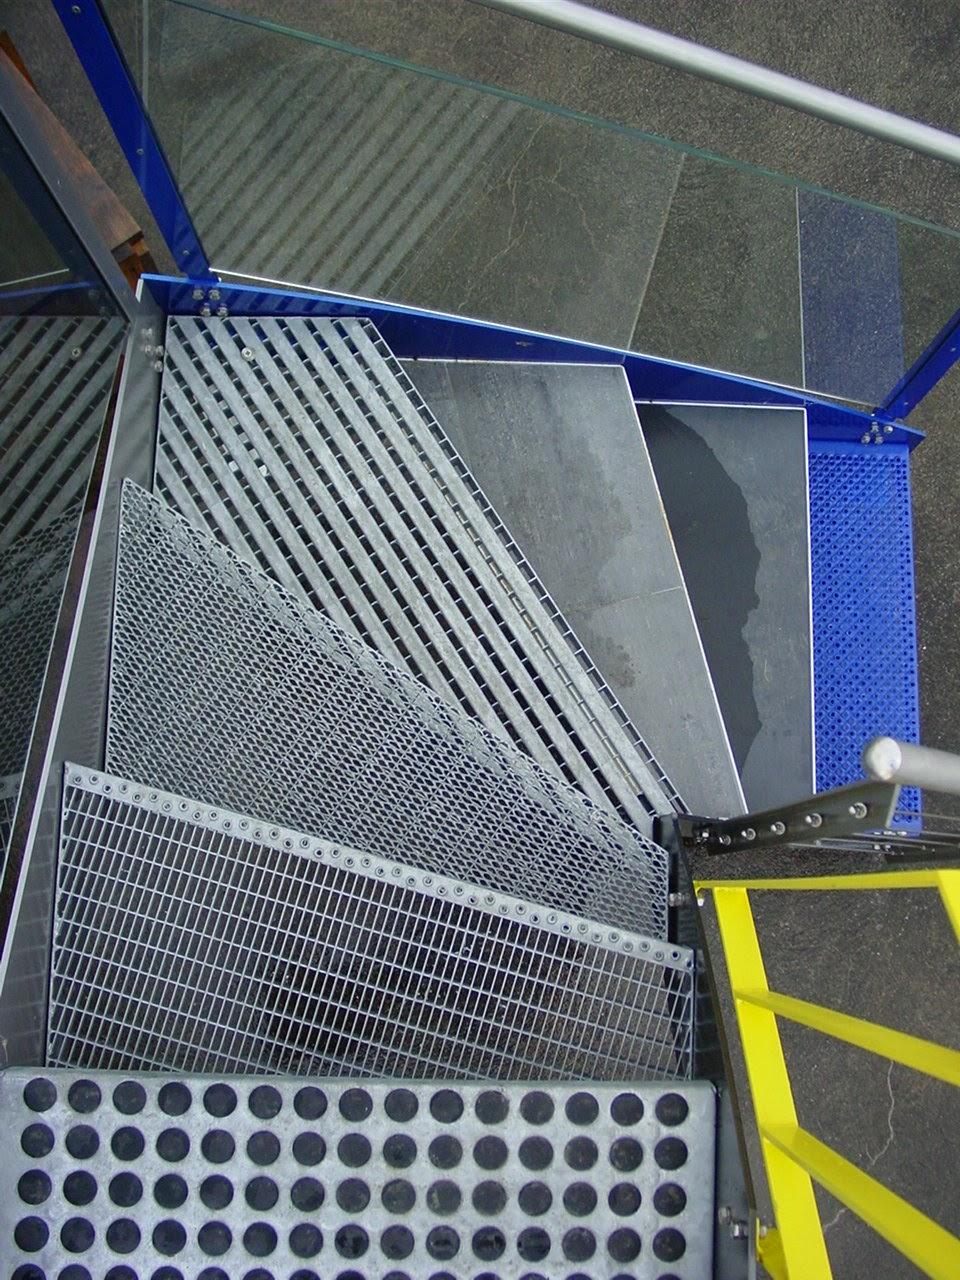 Treppenstufen | Schibler Metallbauteile